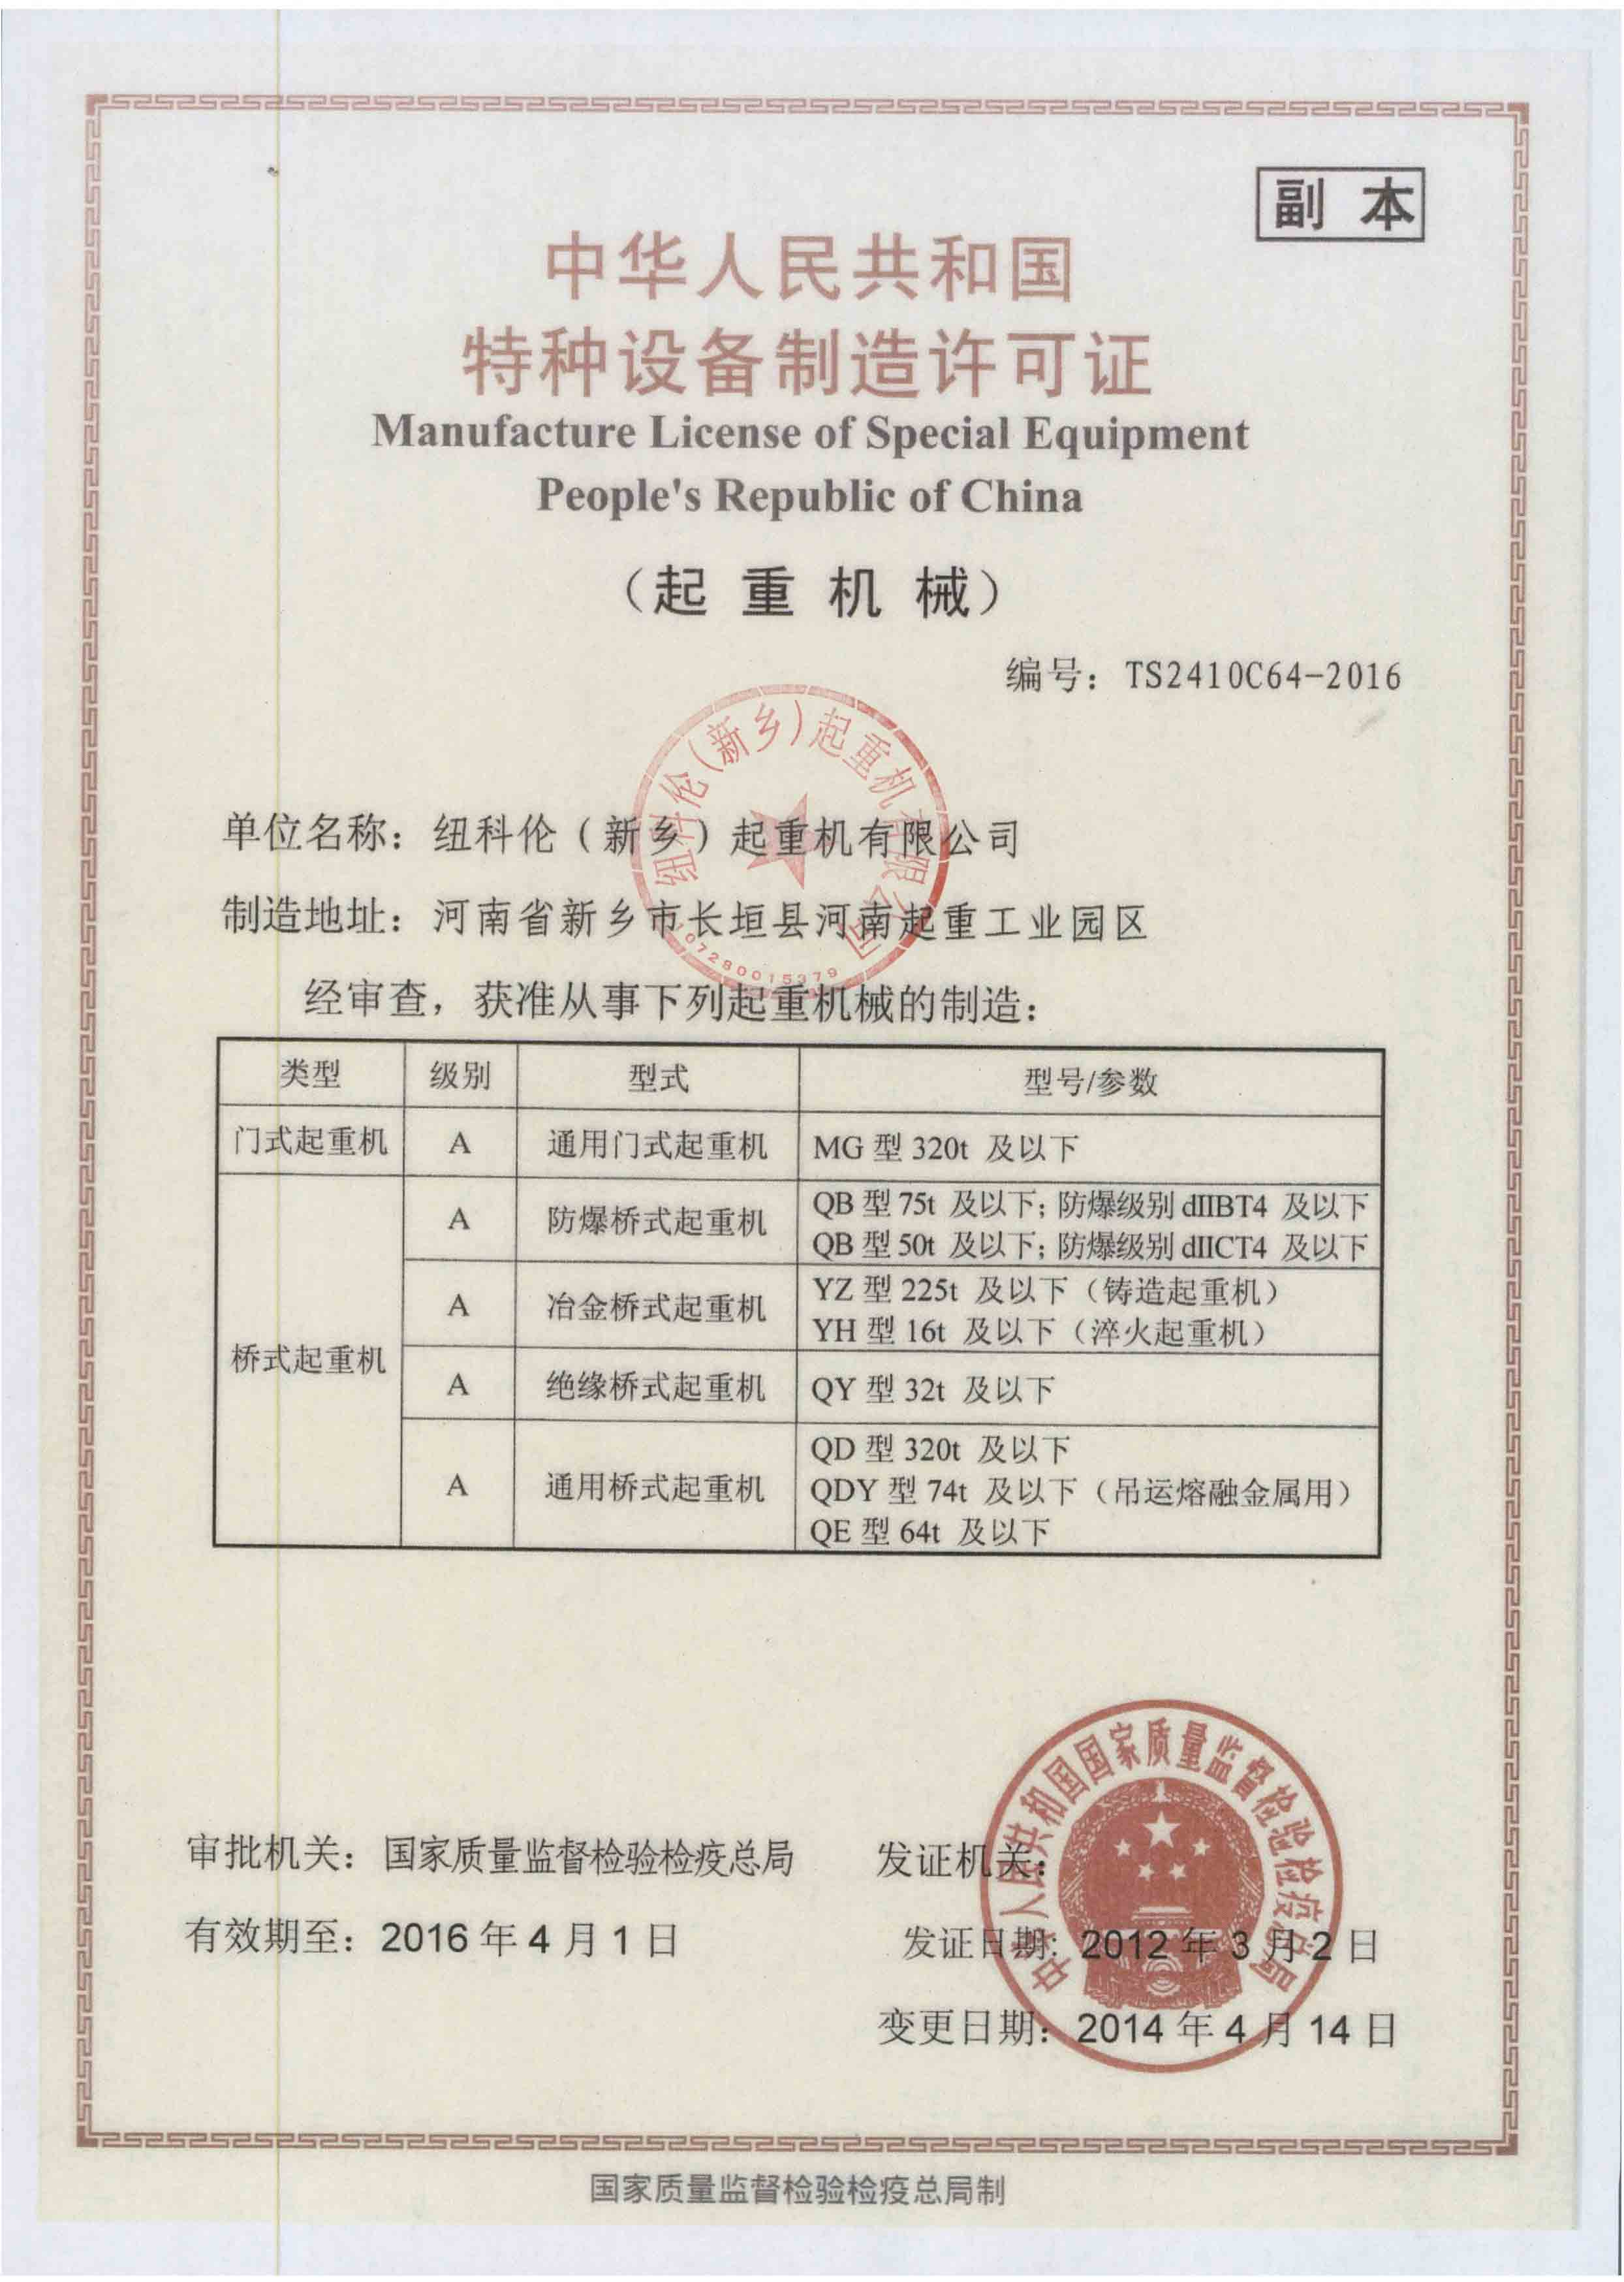 Heavy duty overhead crane/gantry crane manufacture license